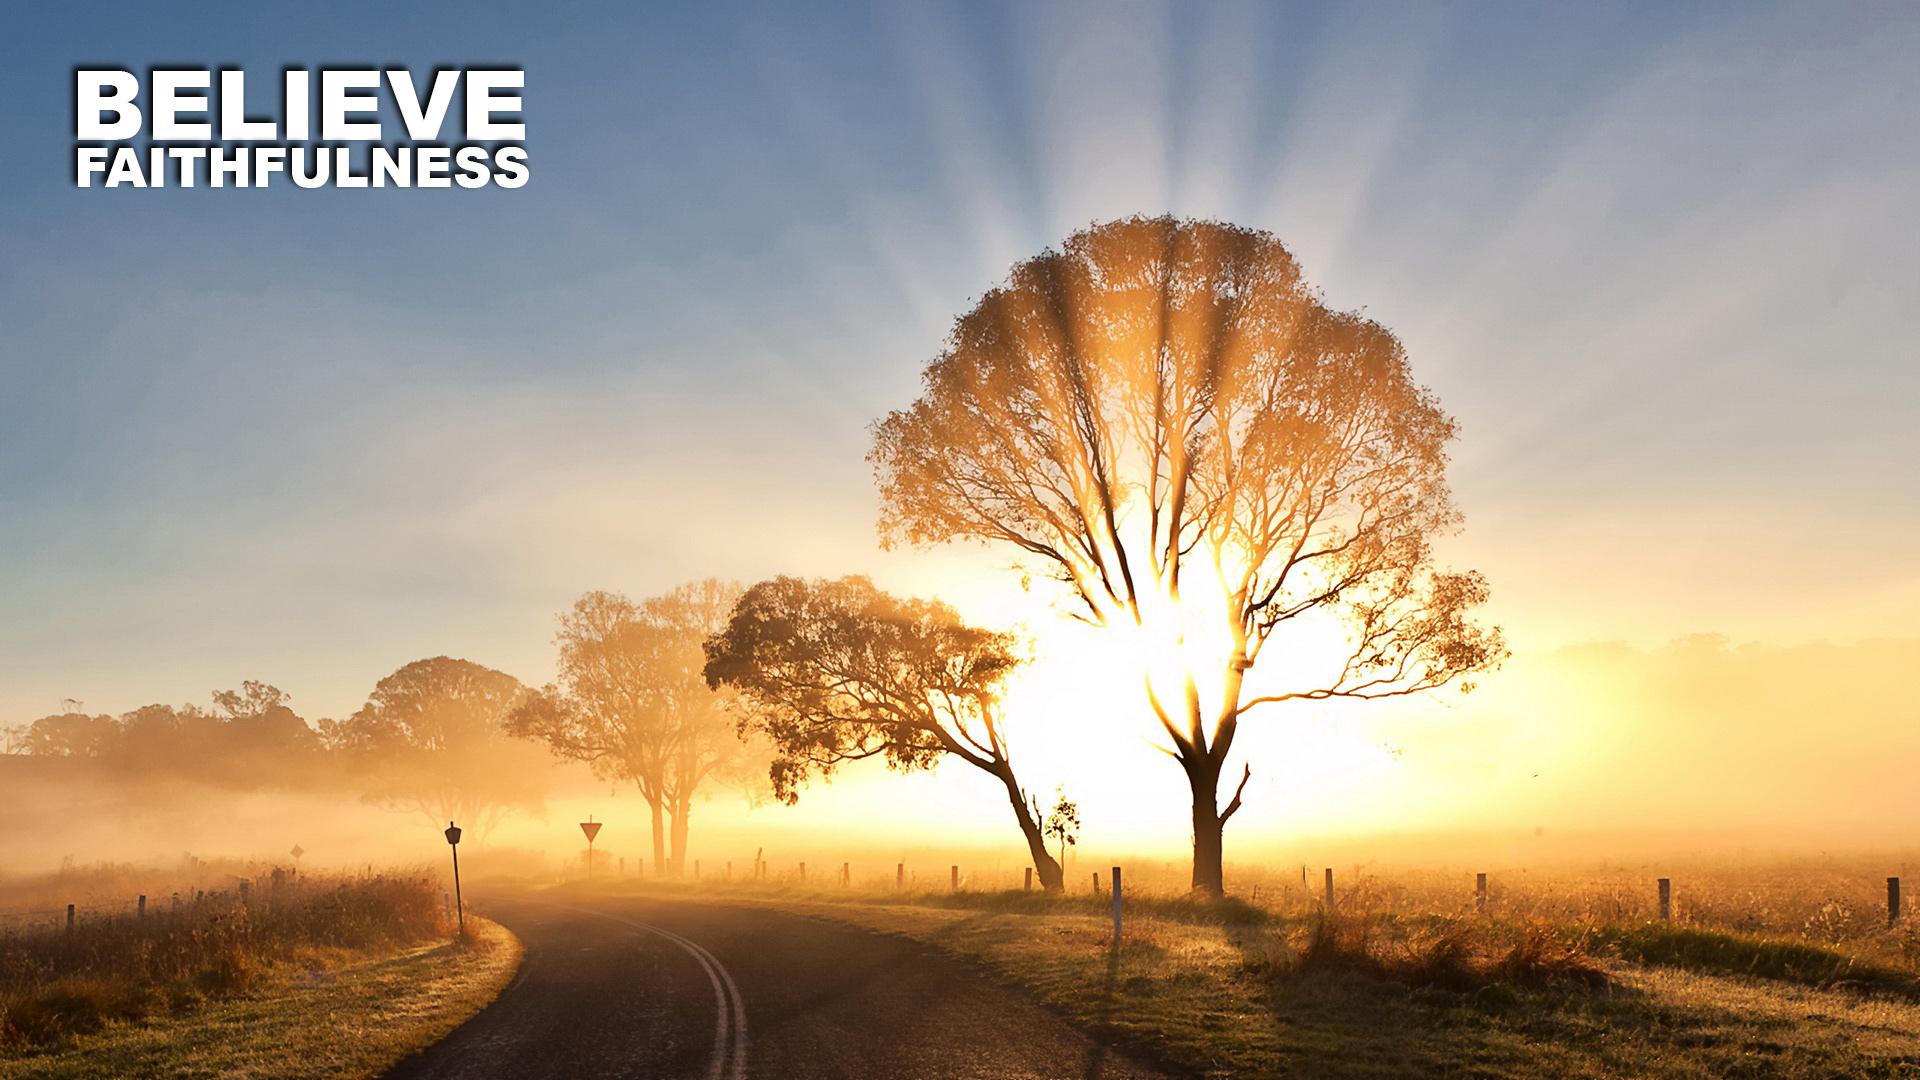 BELIEVE_Devos_Wk28-Faithfulness.jpg